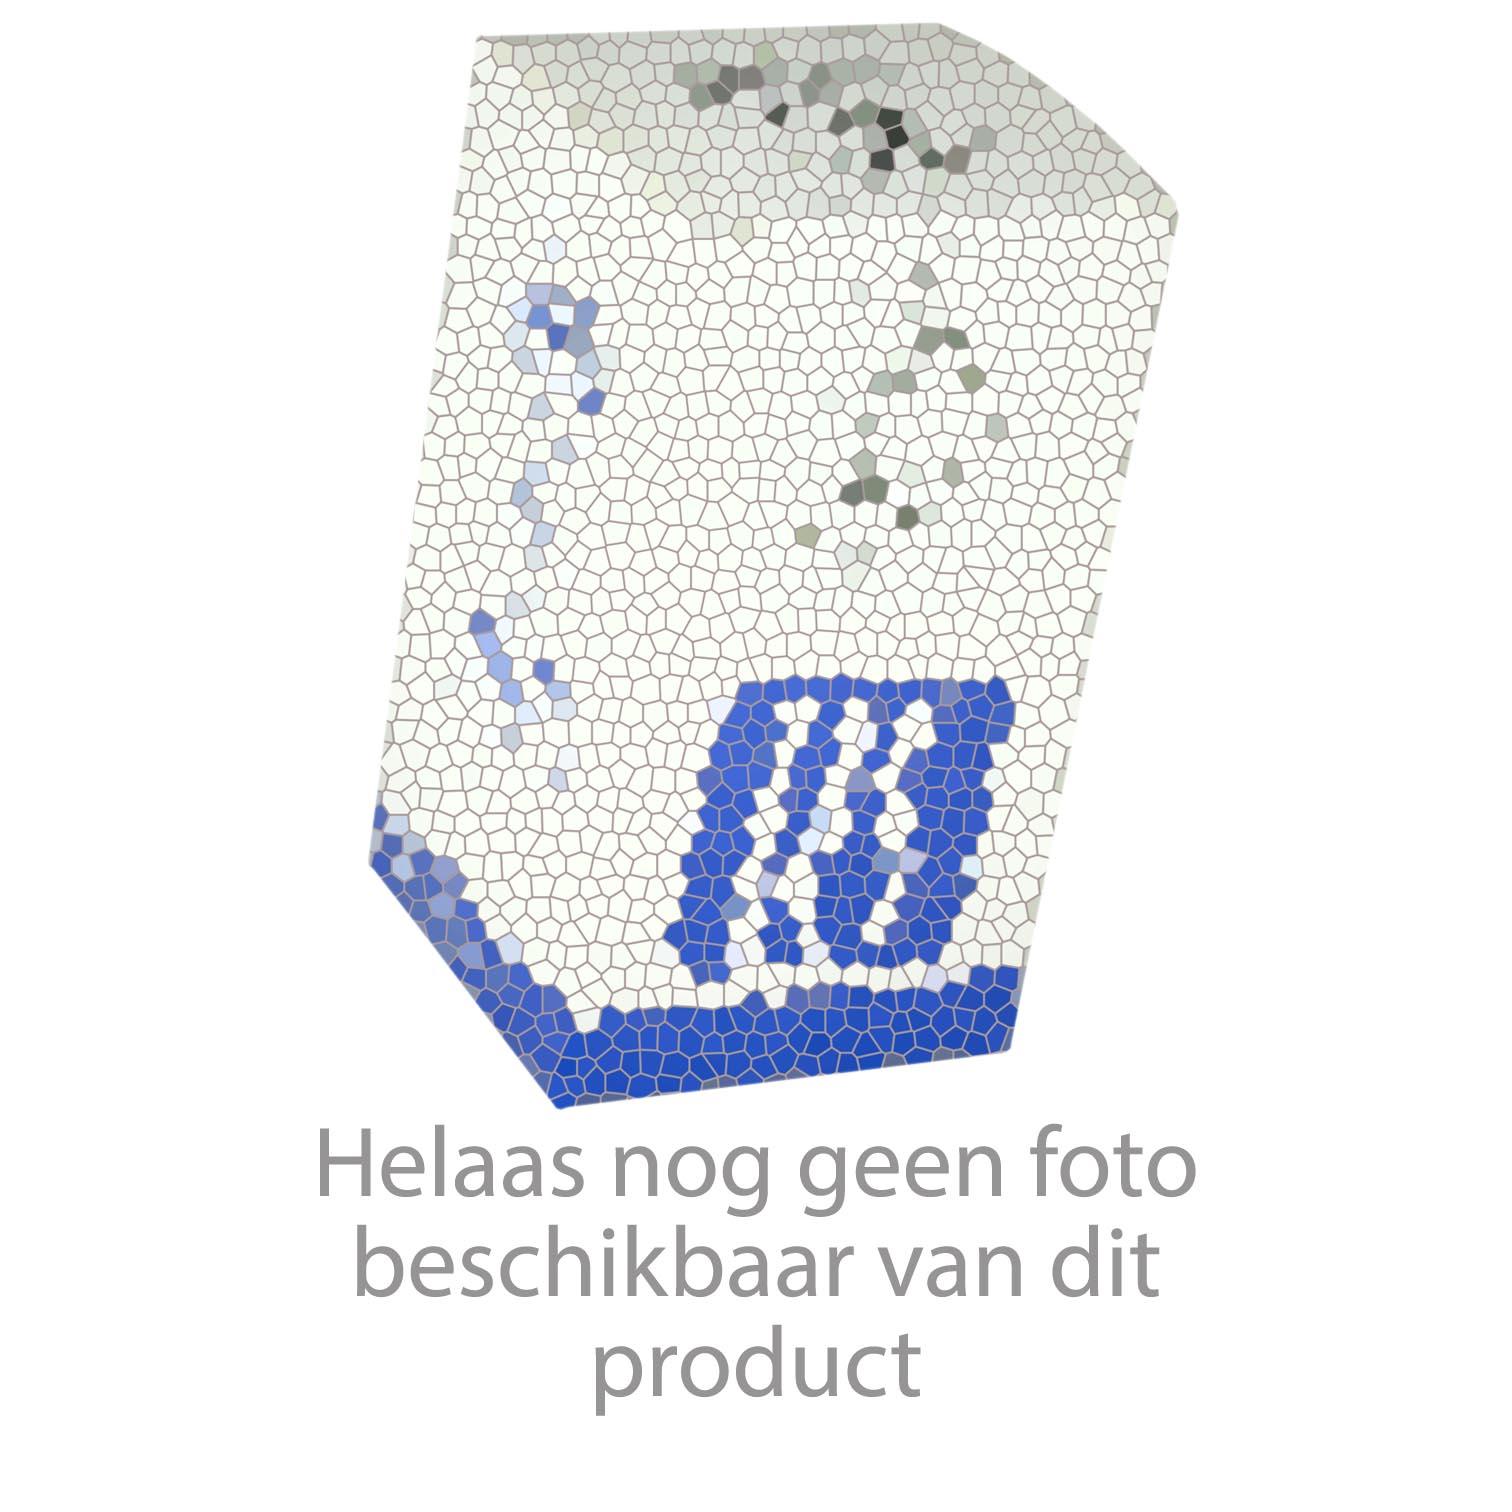 "Viega Overlooppijp gootsteenplug 6/4"" Waterstand 175mm chroom"